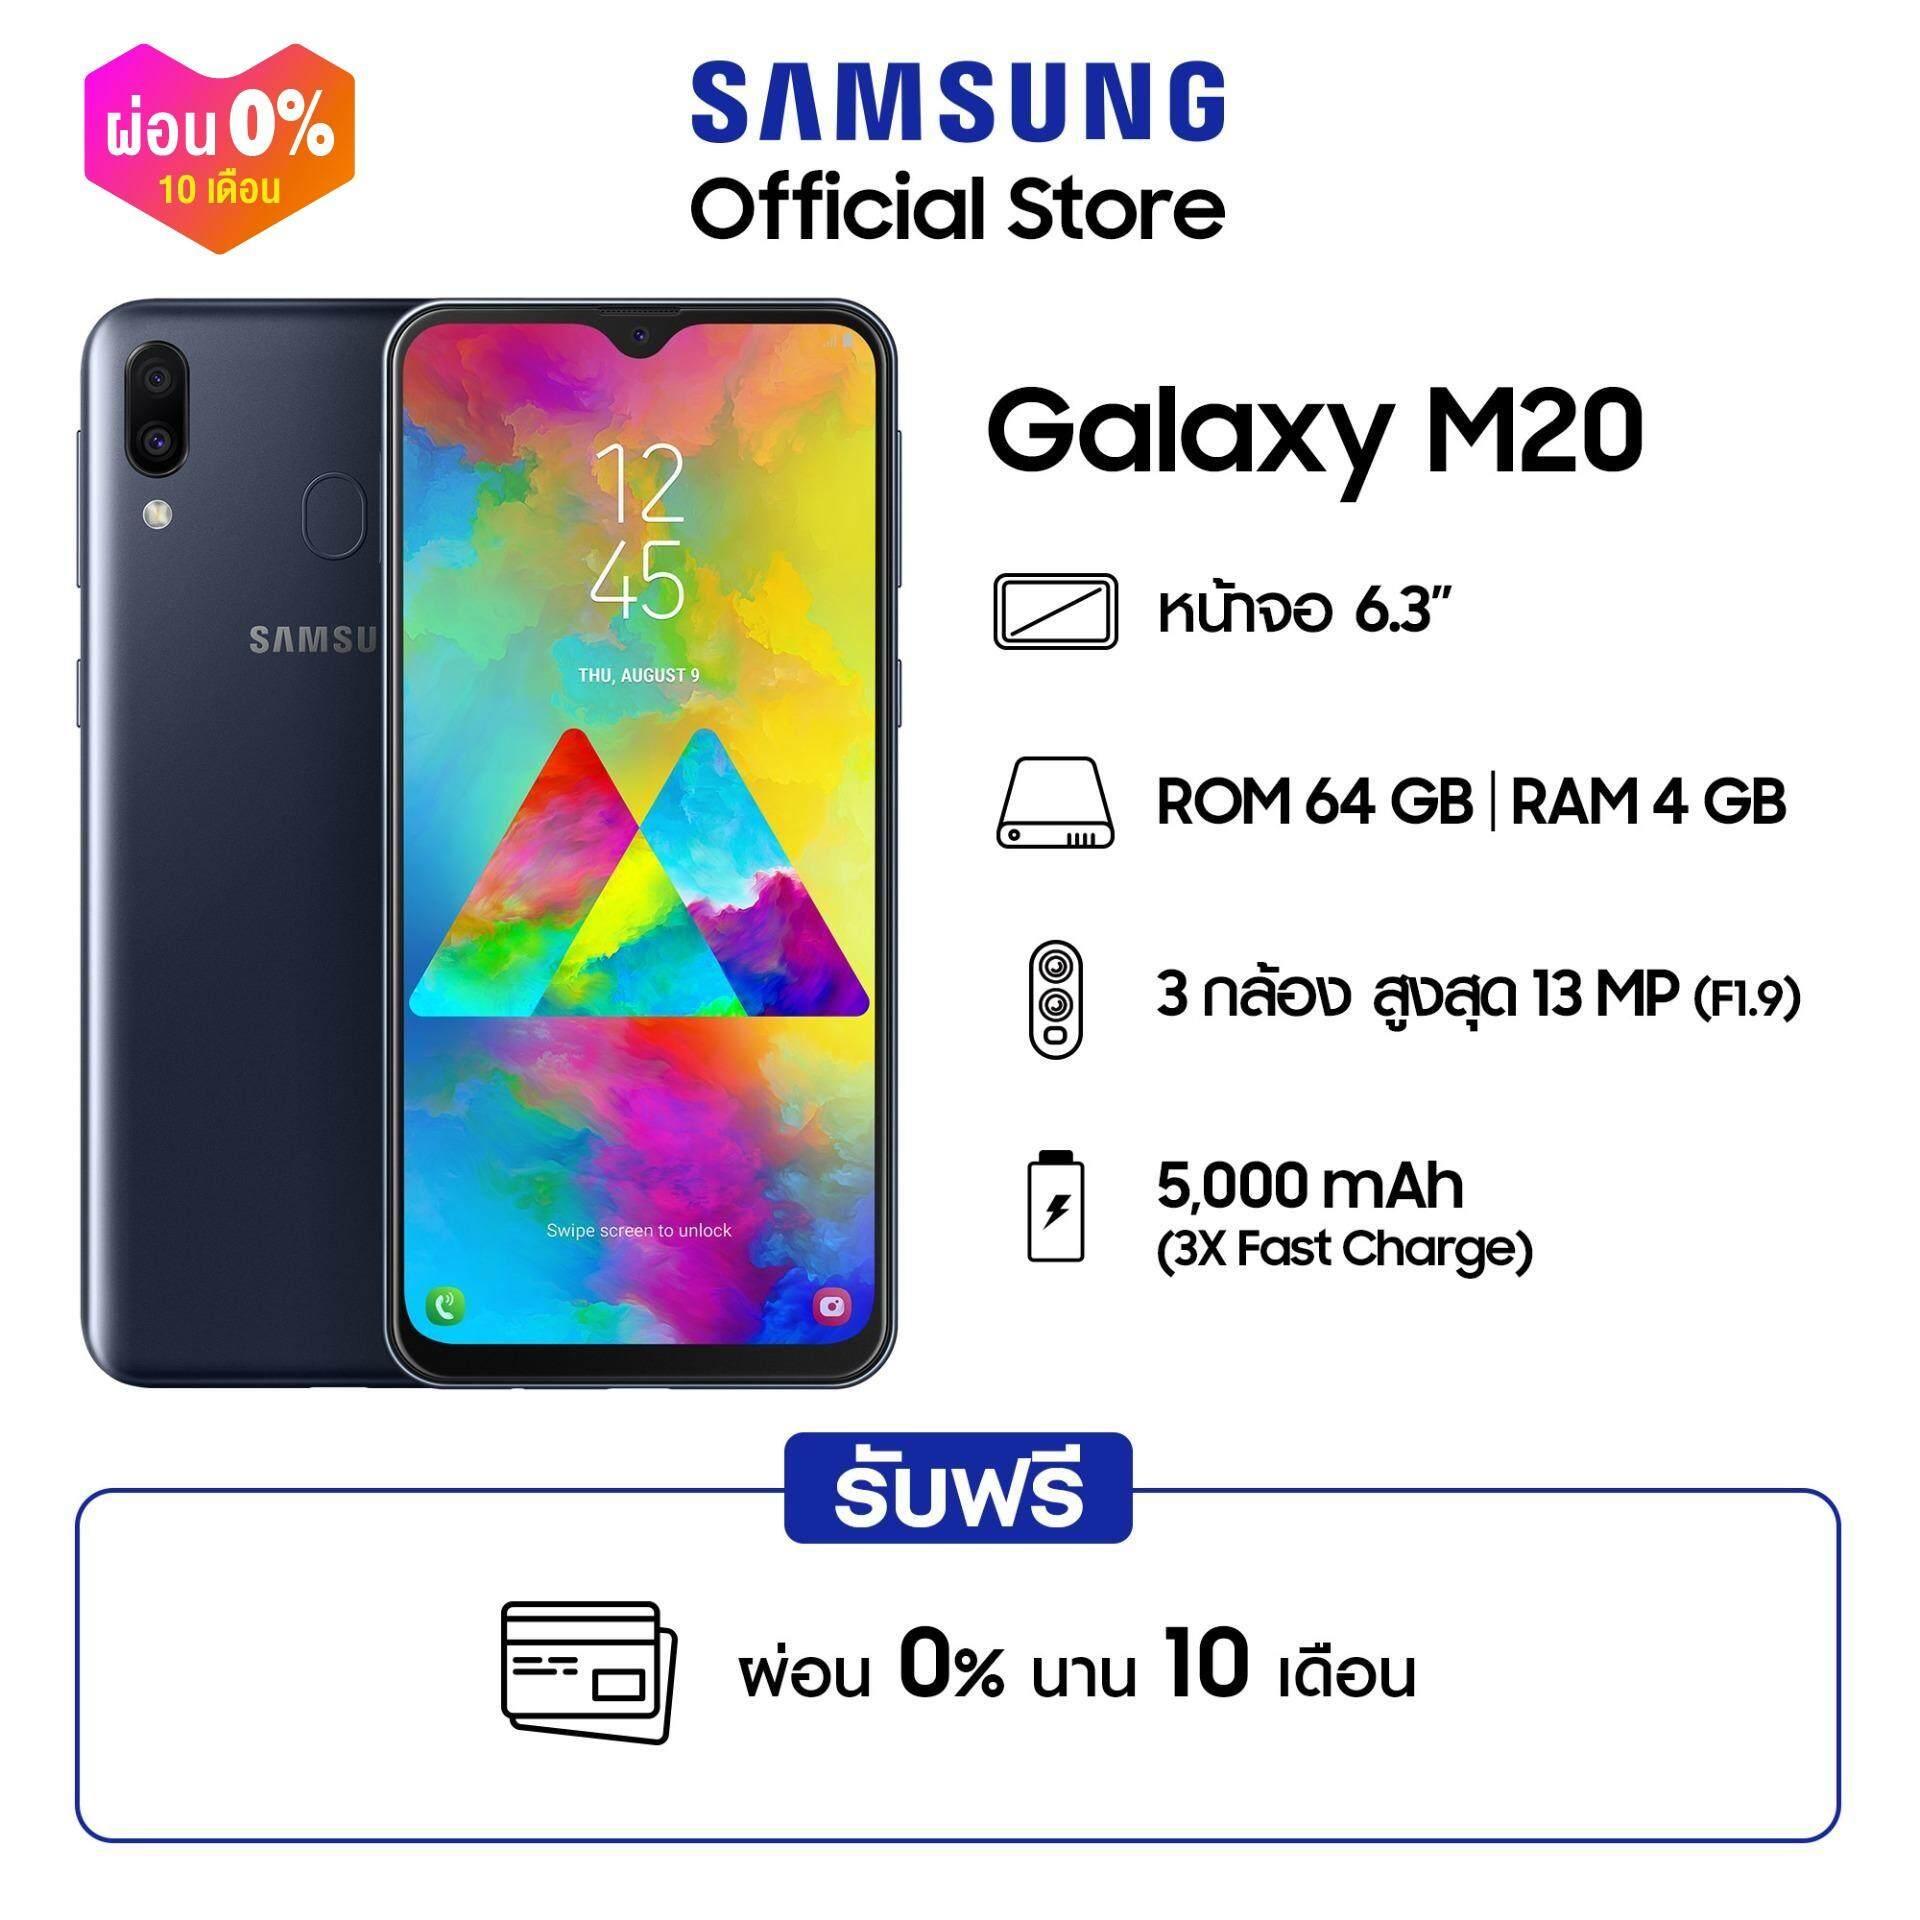 Samsung Galaxy M20 4 GB RAM 64 GB ROM 6.3 นิ้ว 3 กล้อง Battery 5,000 mAh 15W Fast charge - โทรศัพท์มือถือ samsung galaxy m20 แบต 5,000 ราคาเพียง 3,990.- - Samsung Galaxy M20 แบต 5,000 ราคาเพียง 3,990.-